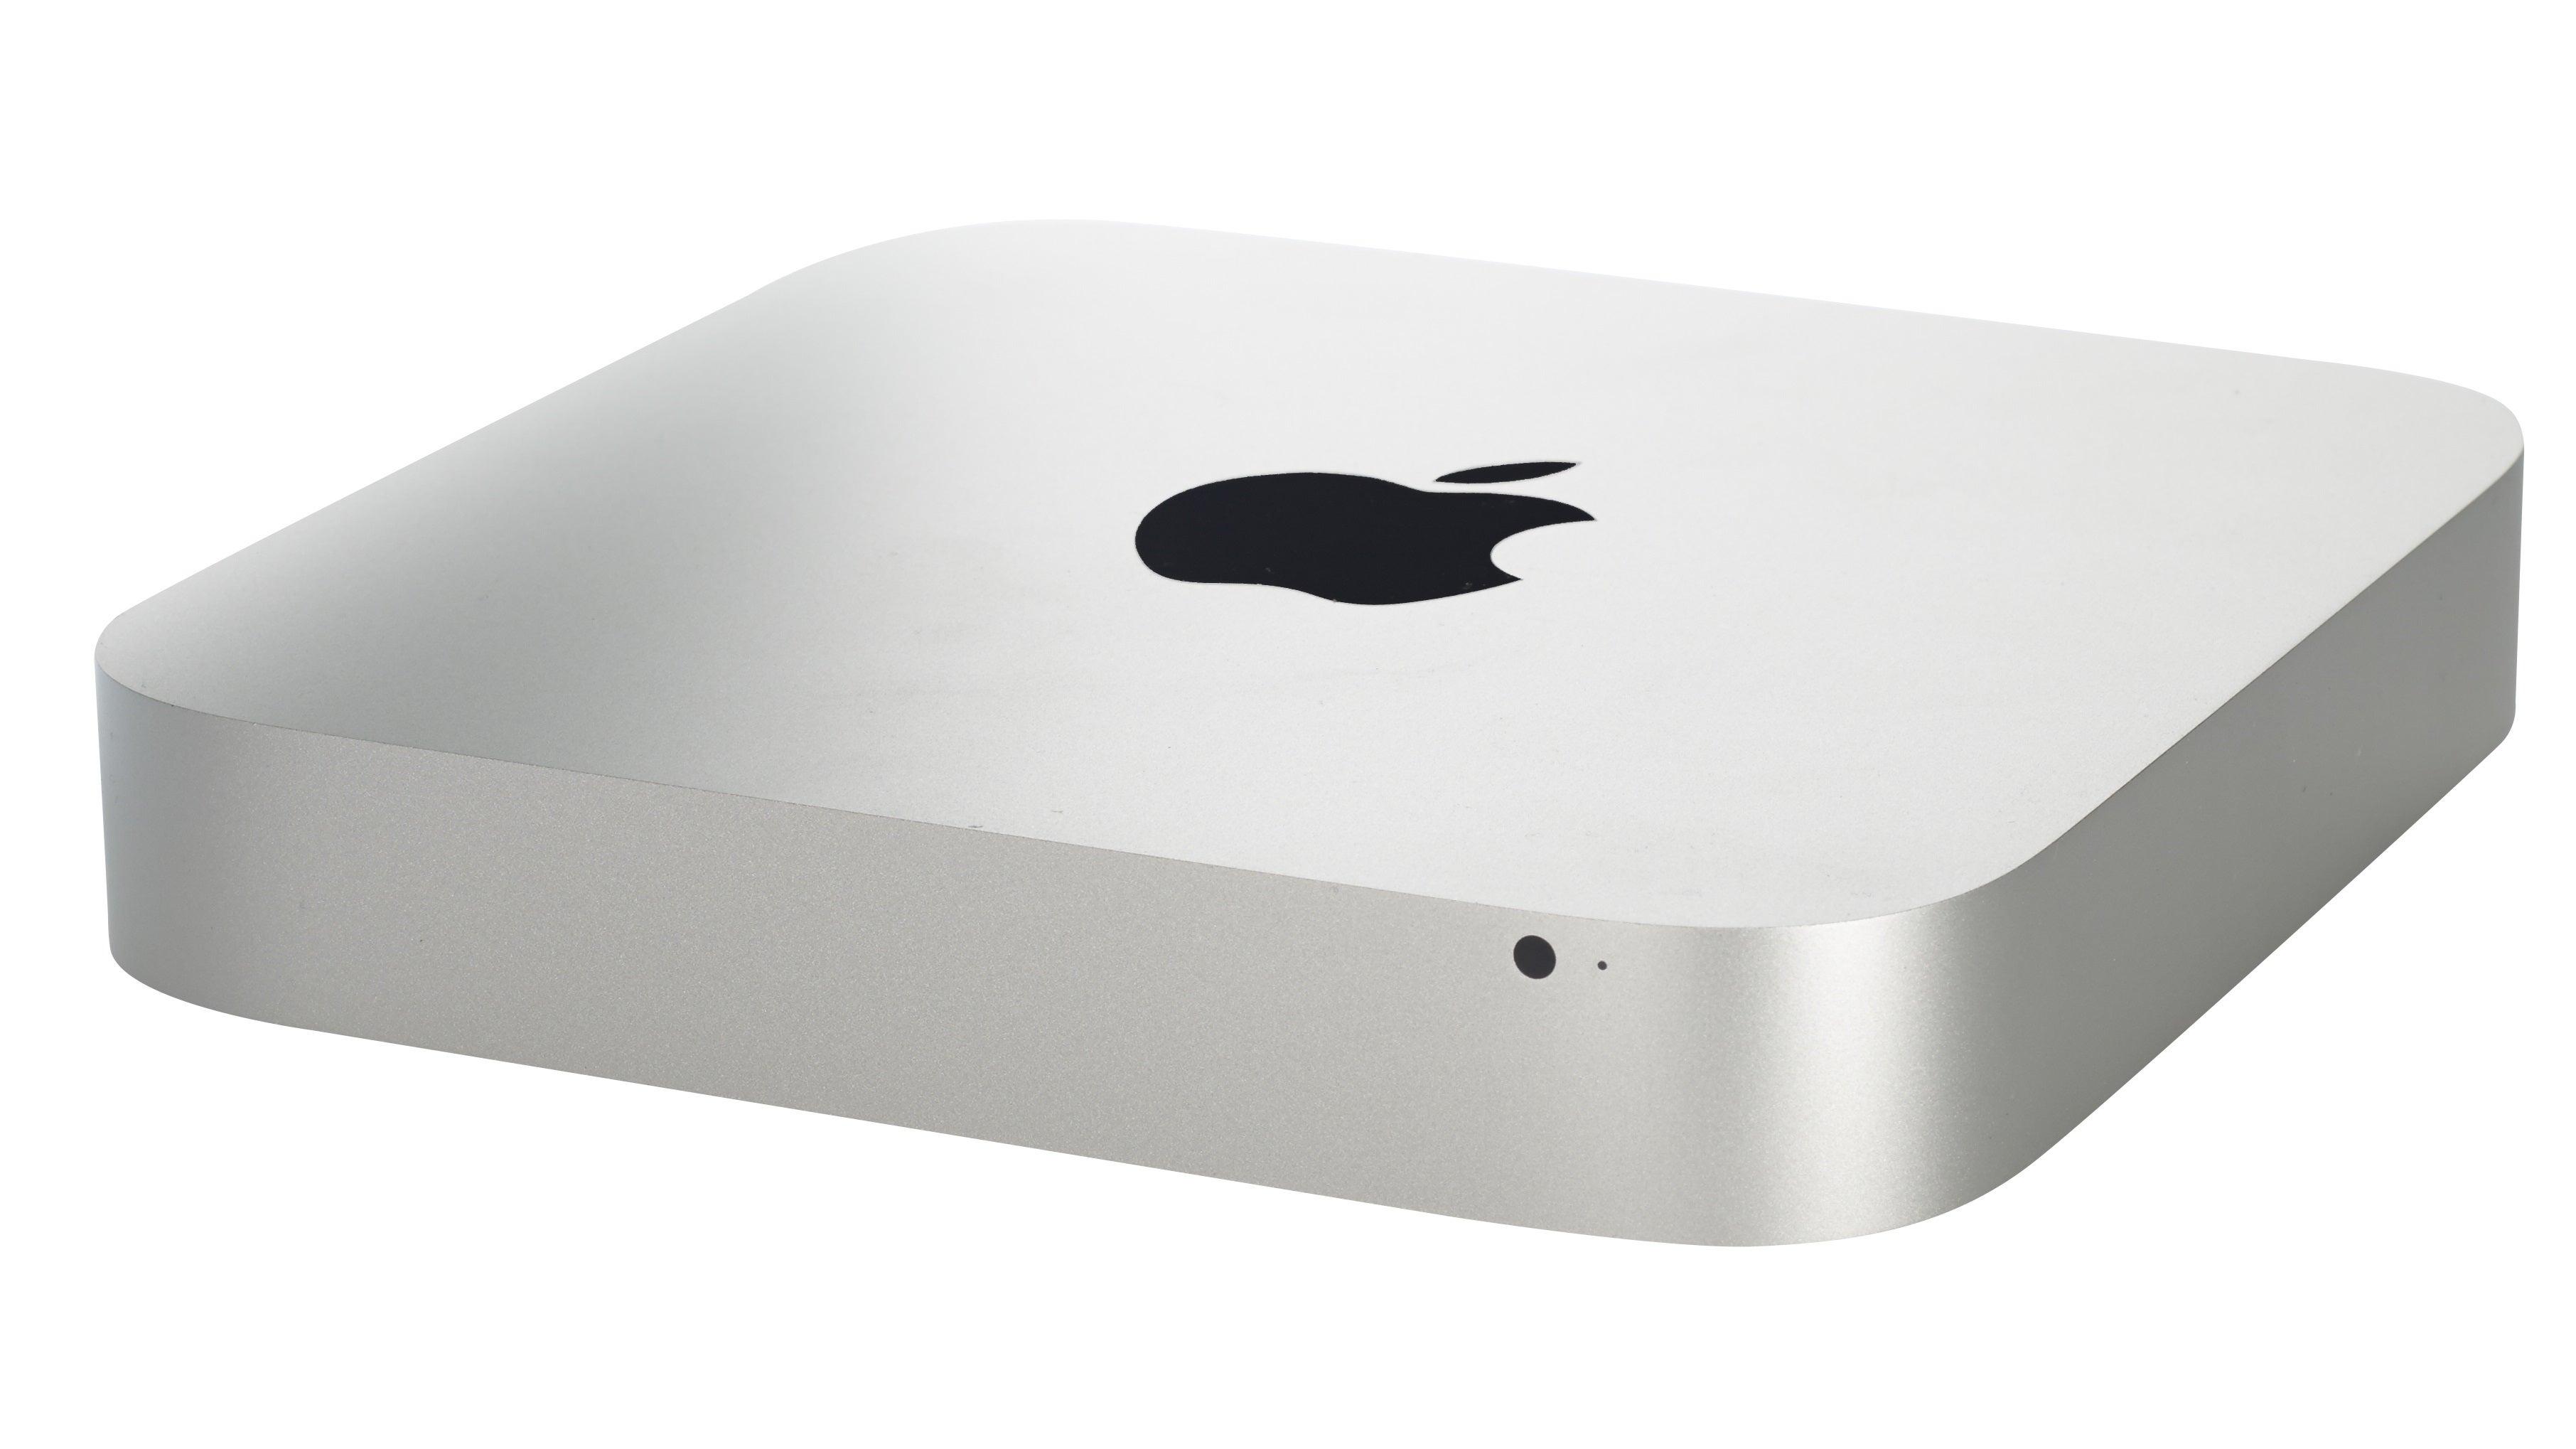 Apple Mac Mini Desktop